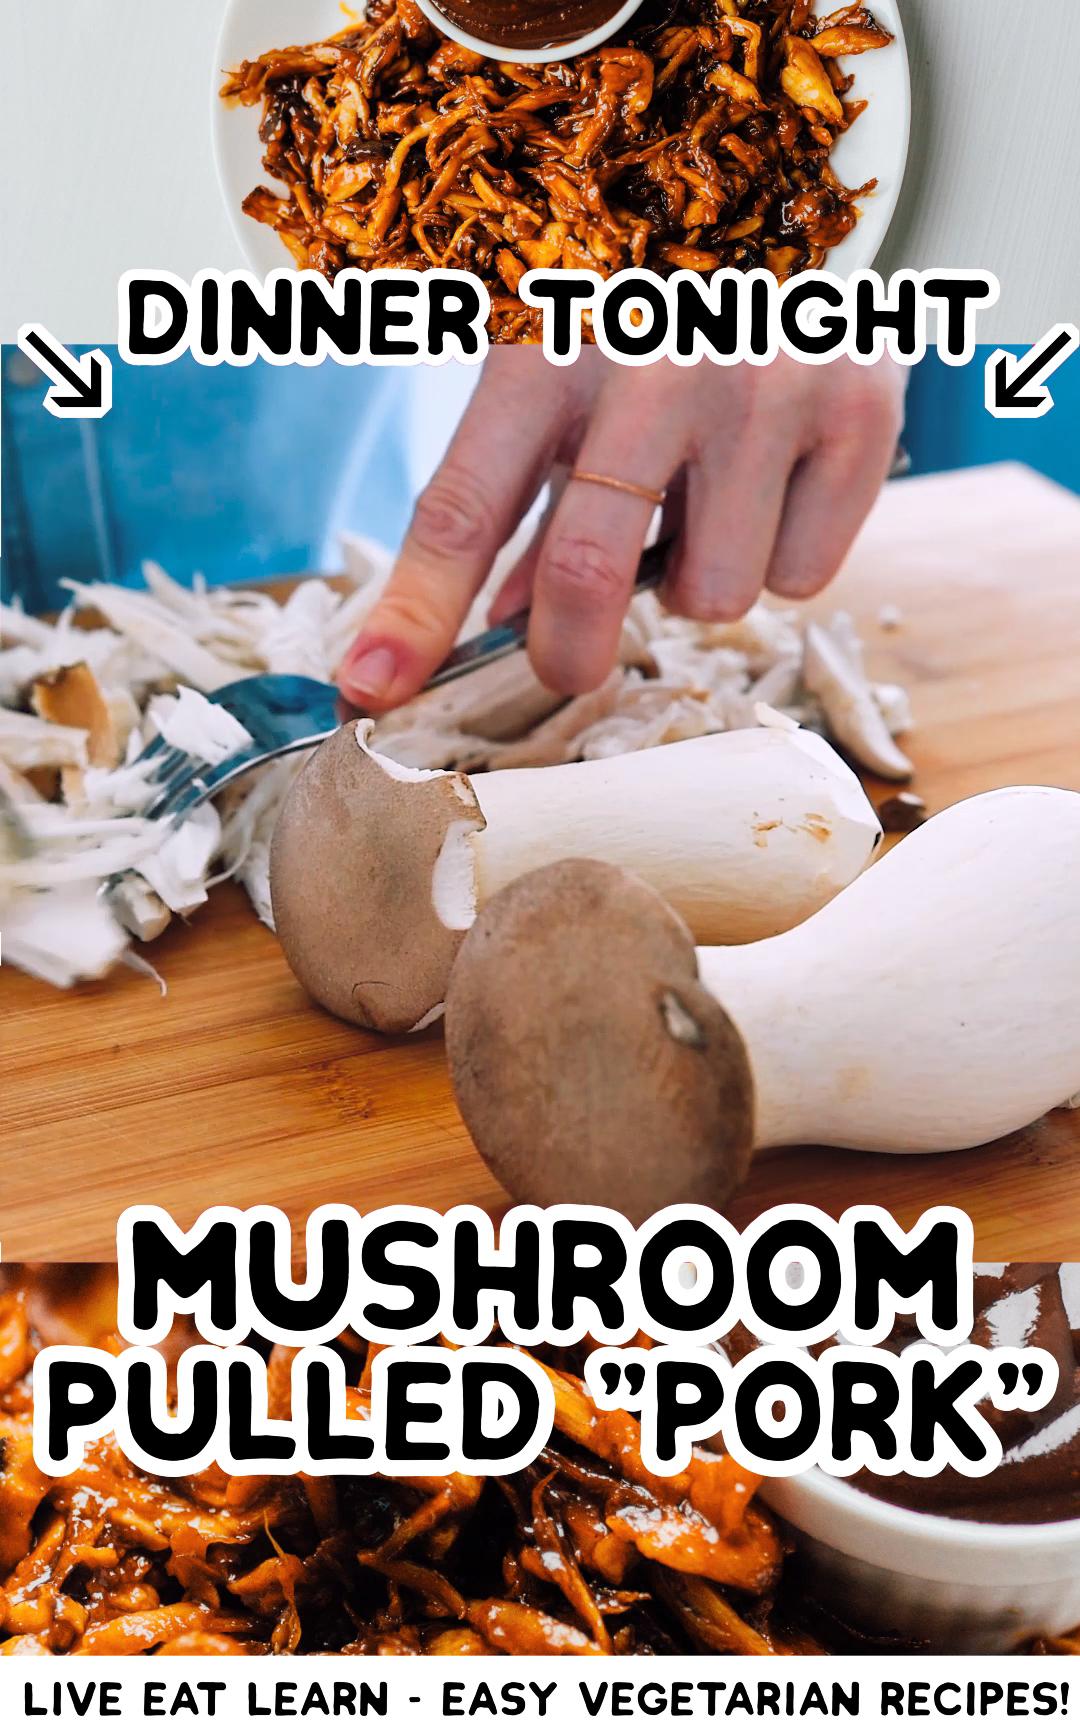 King Oyster Mushroom Pulled Pork